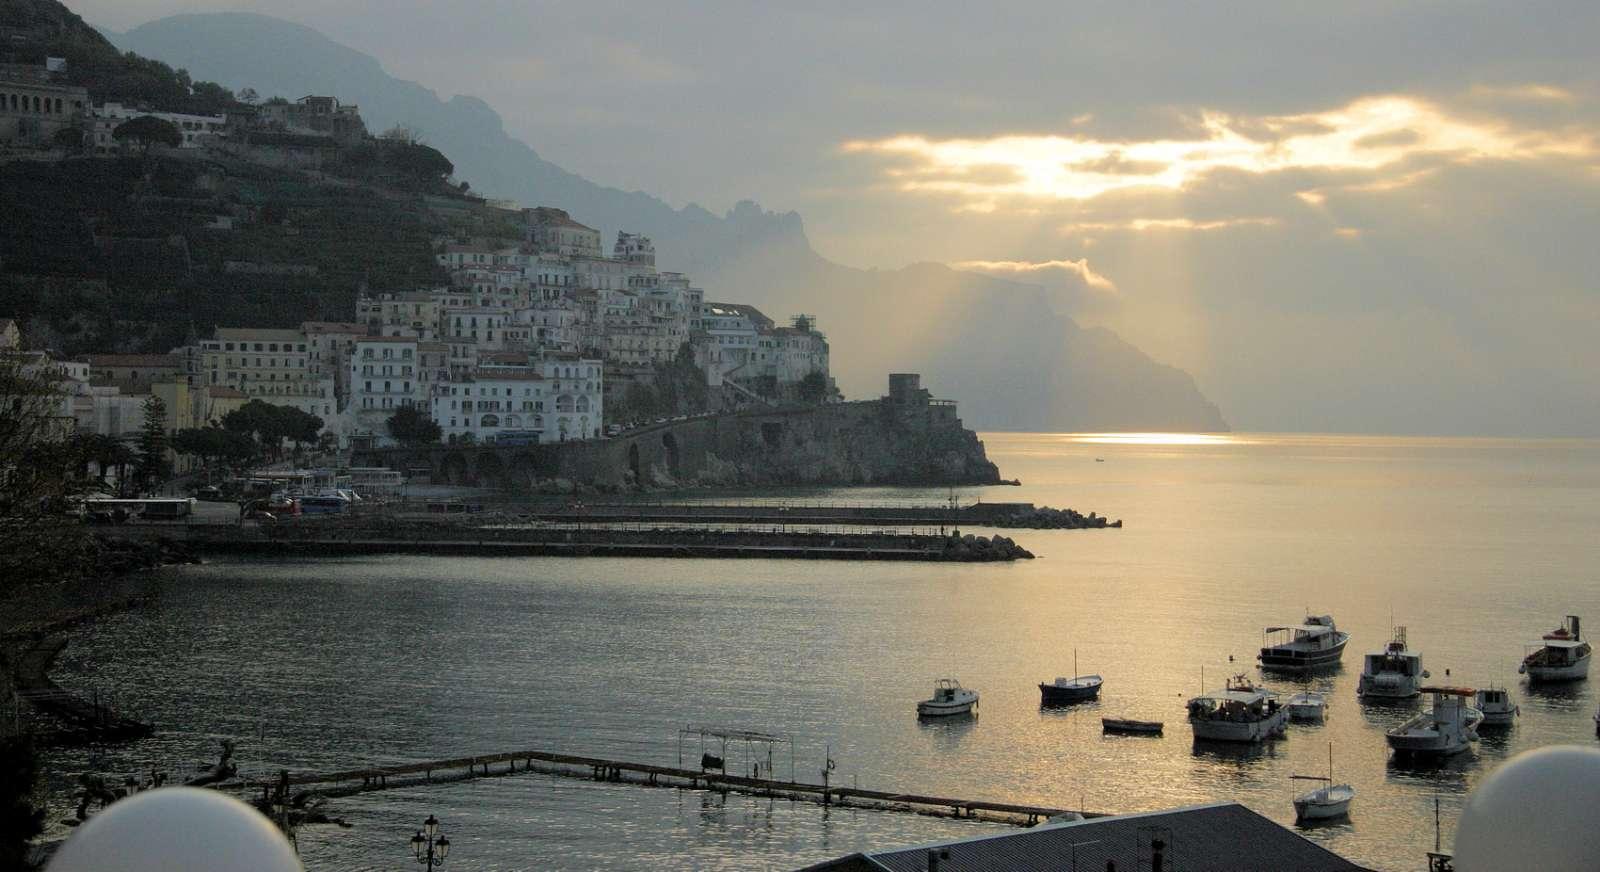 Beautiful view of the coastline and Amalfi